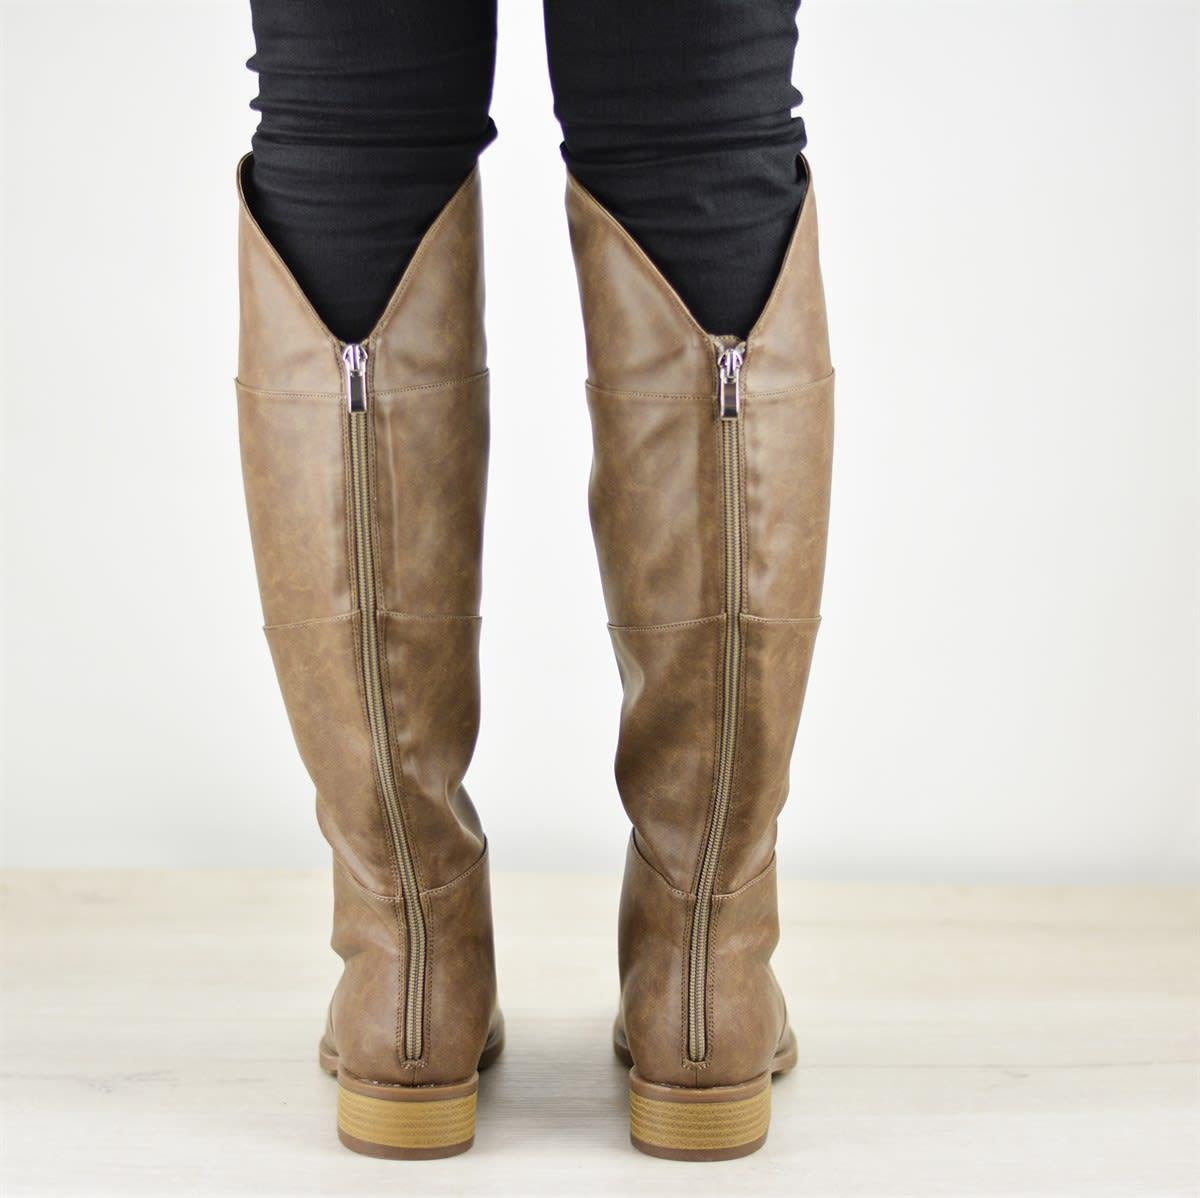 1b610cf6daf Comfort Sole Knee-High Boot